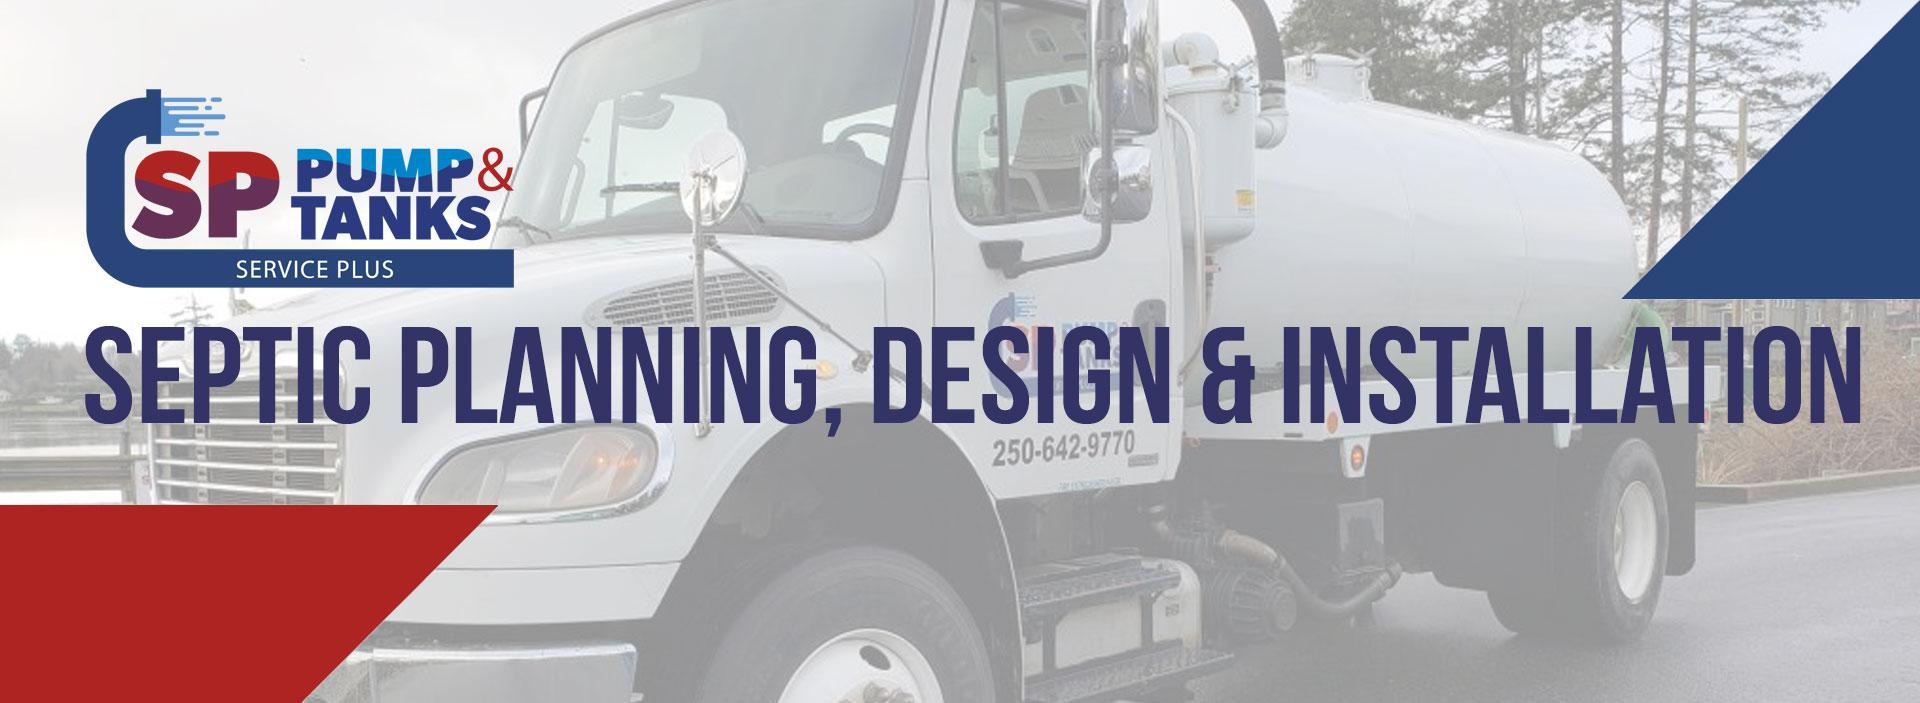 septic planning design installation